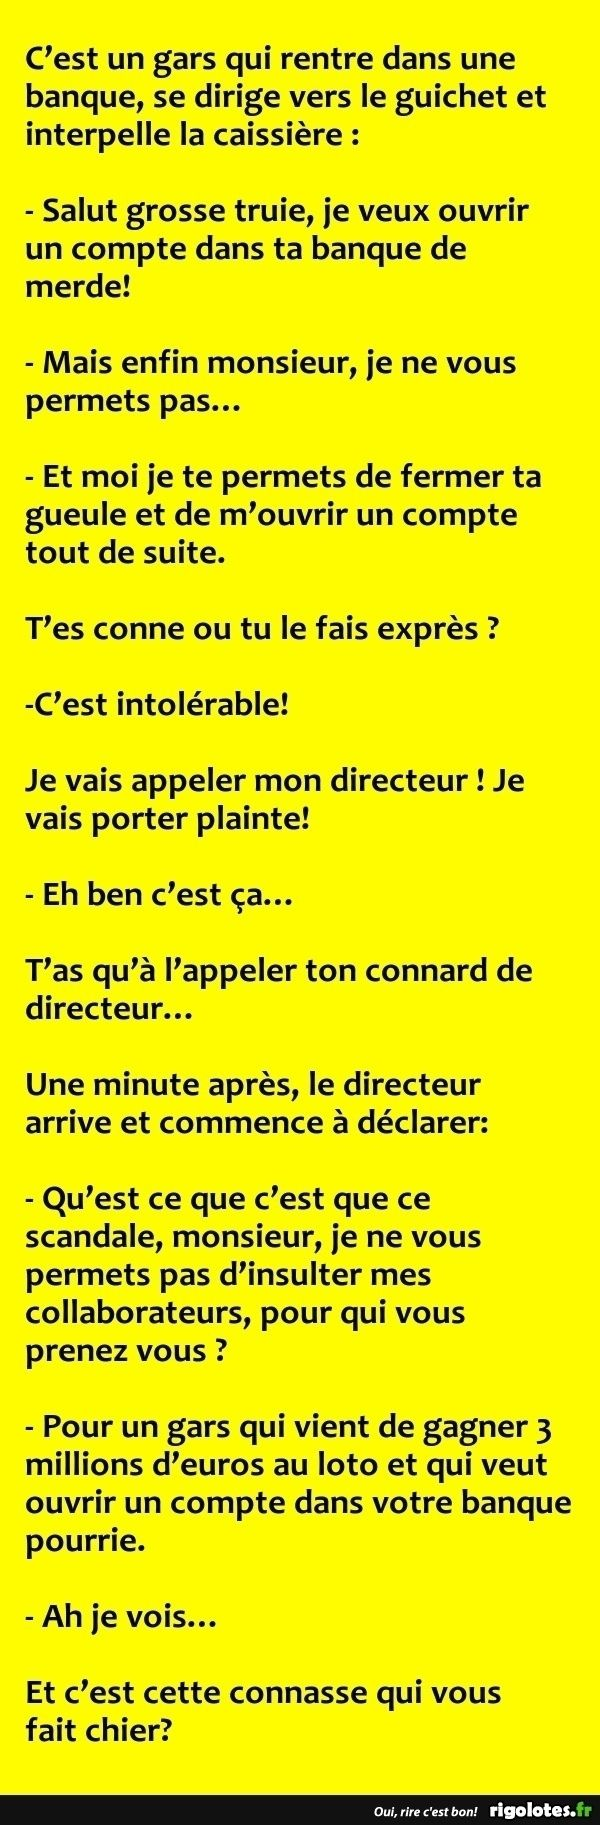 C'est un gars qui rentre dans une banque... - RIGOLOTES.fr